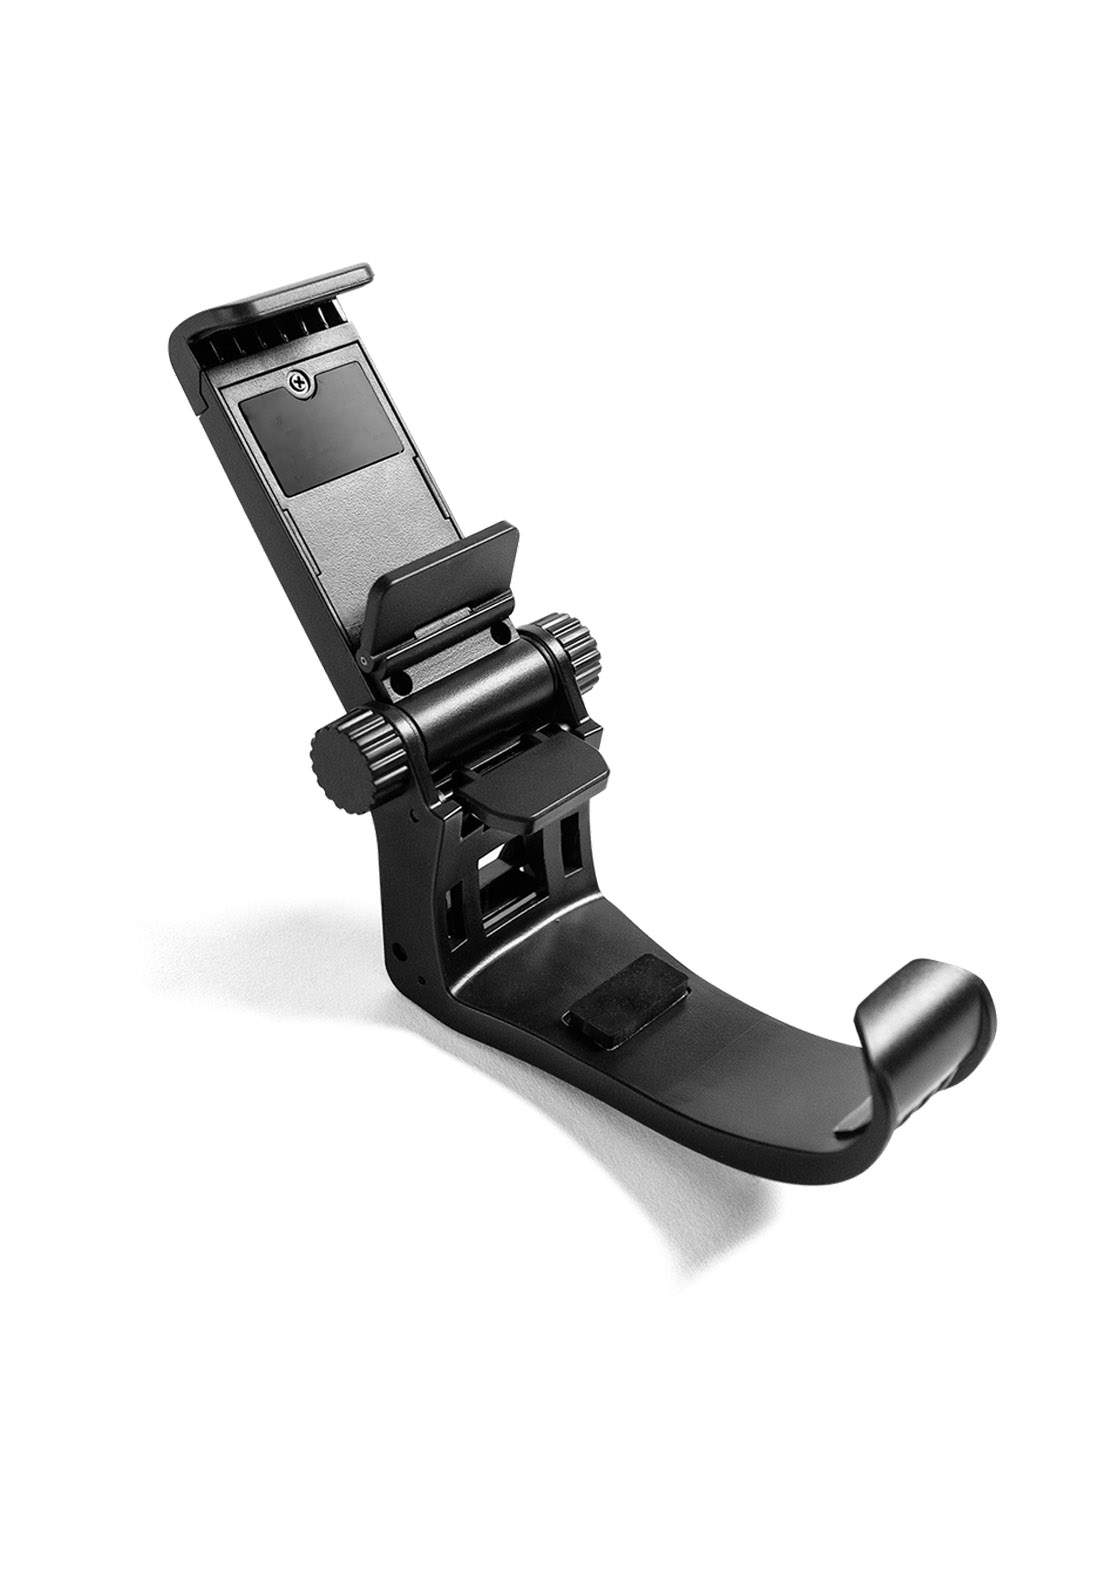 Steelseries Mobile Phone Holder for Controllers - Black حامل وحدة التحكم